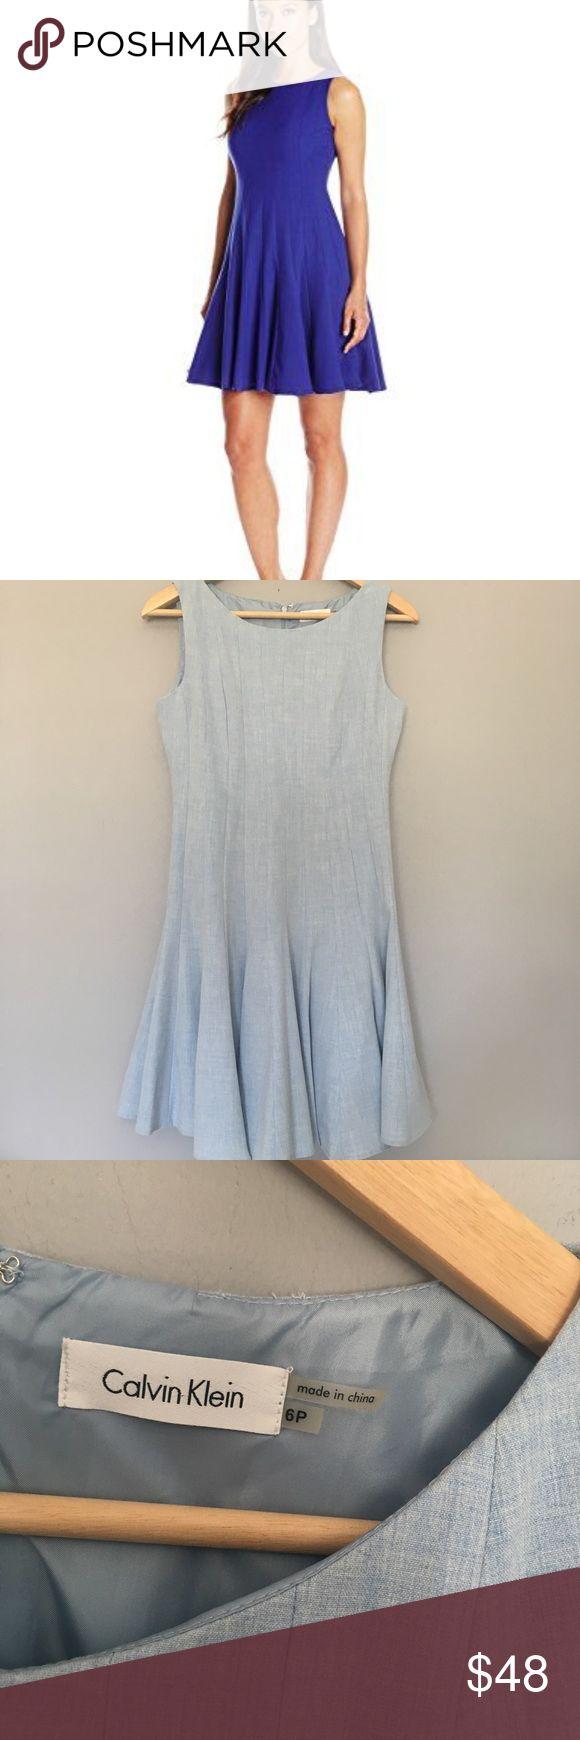 Calvin Klein baby blue dress Excellent condition. Size 6 petite. Calvin Klein Dresses